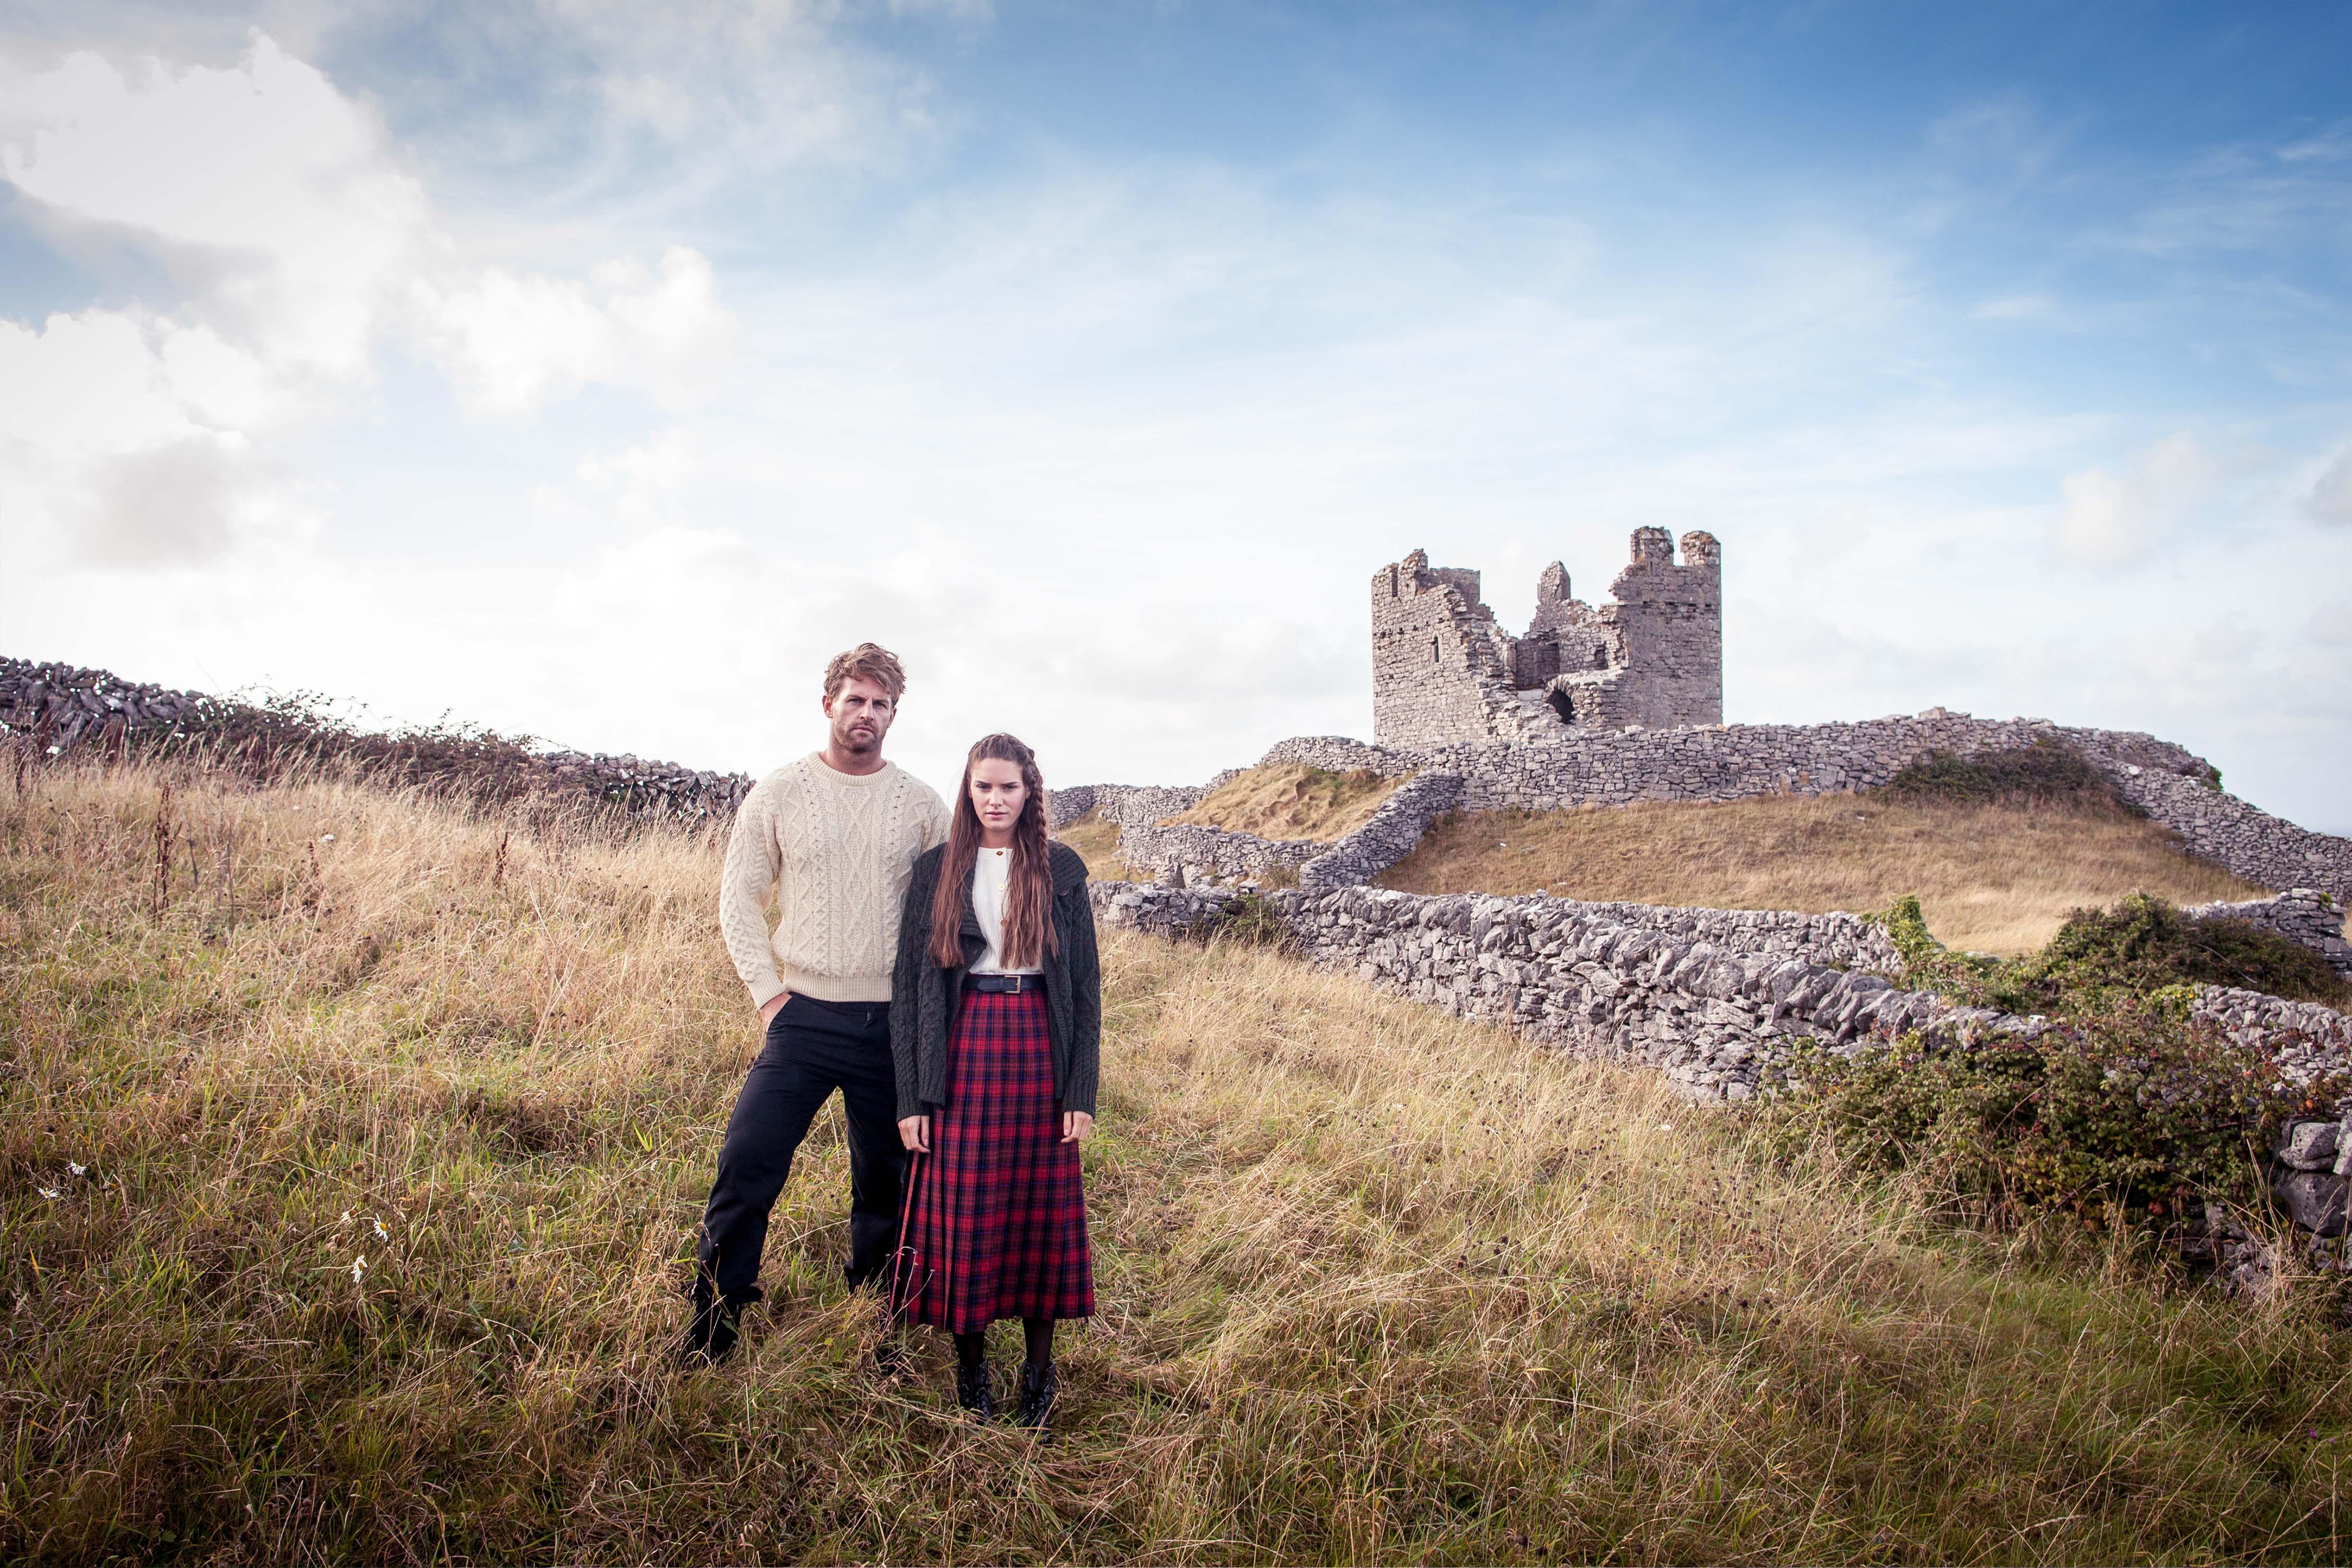 Irish Aran Sweater - An Honoured Fashion Treasure